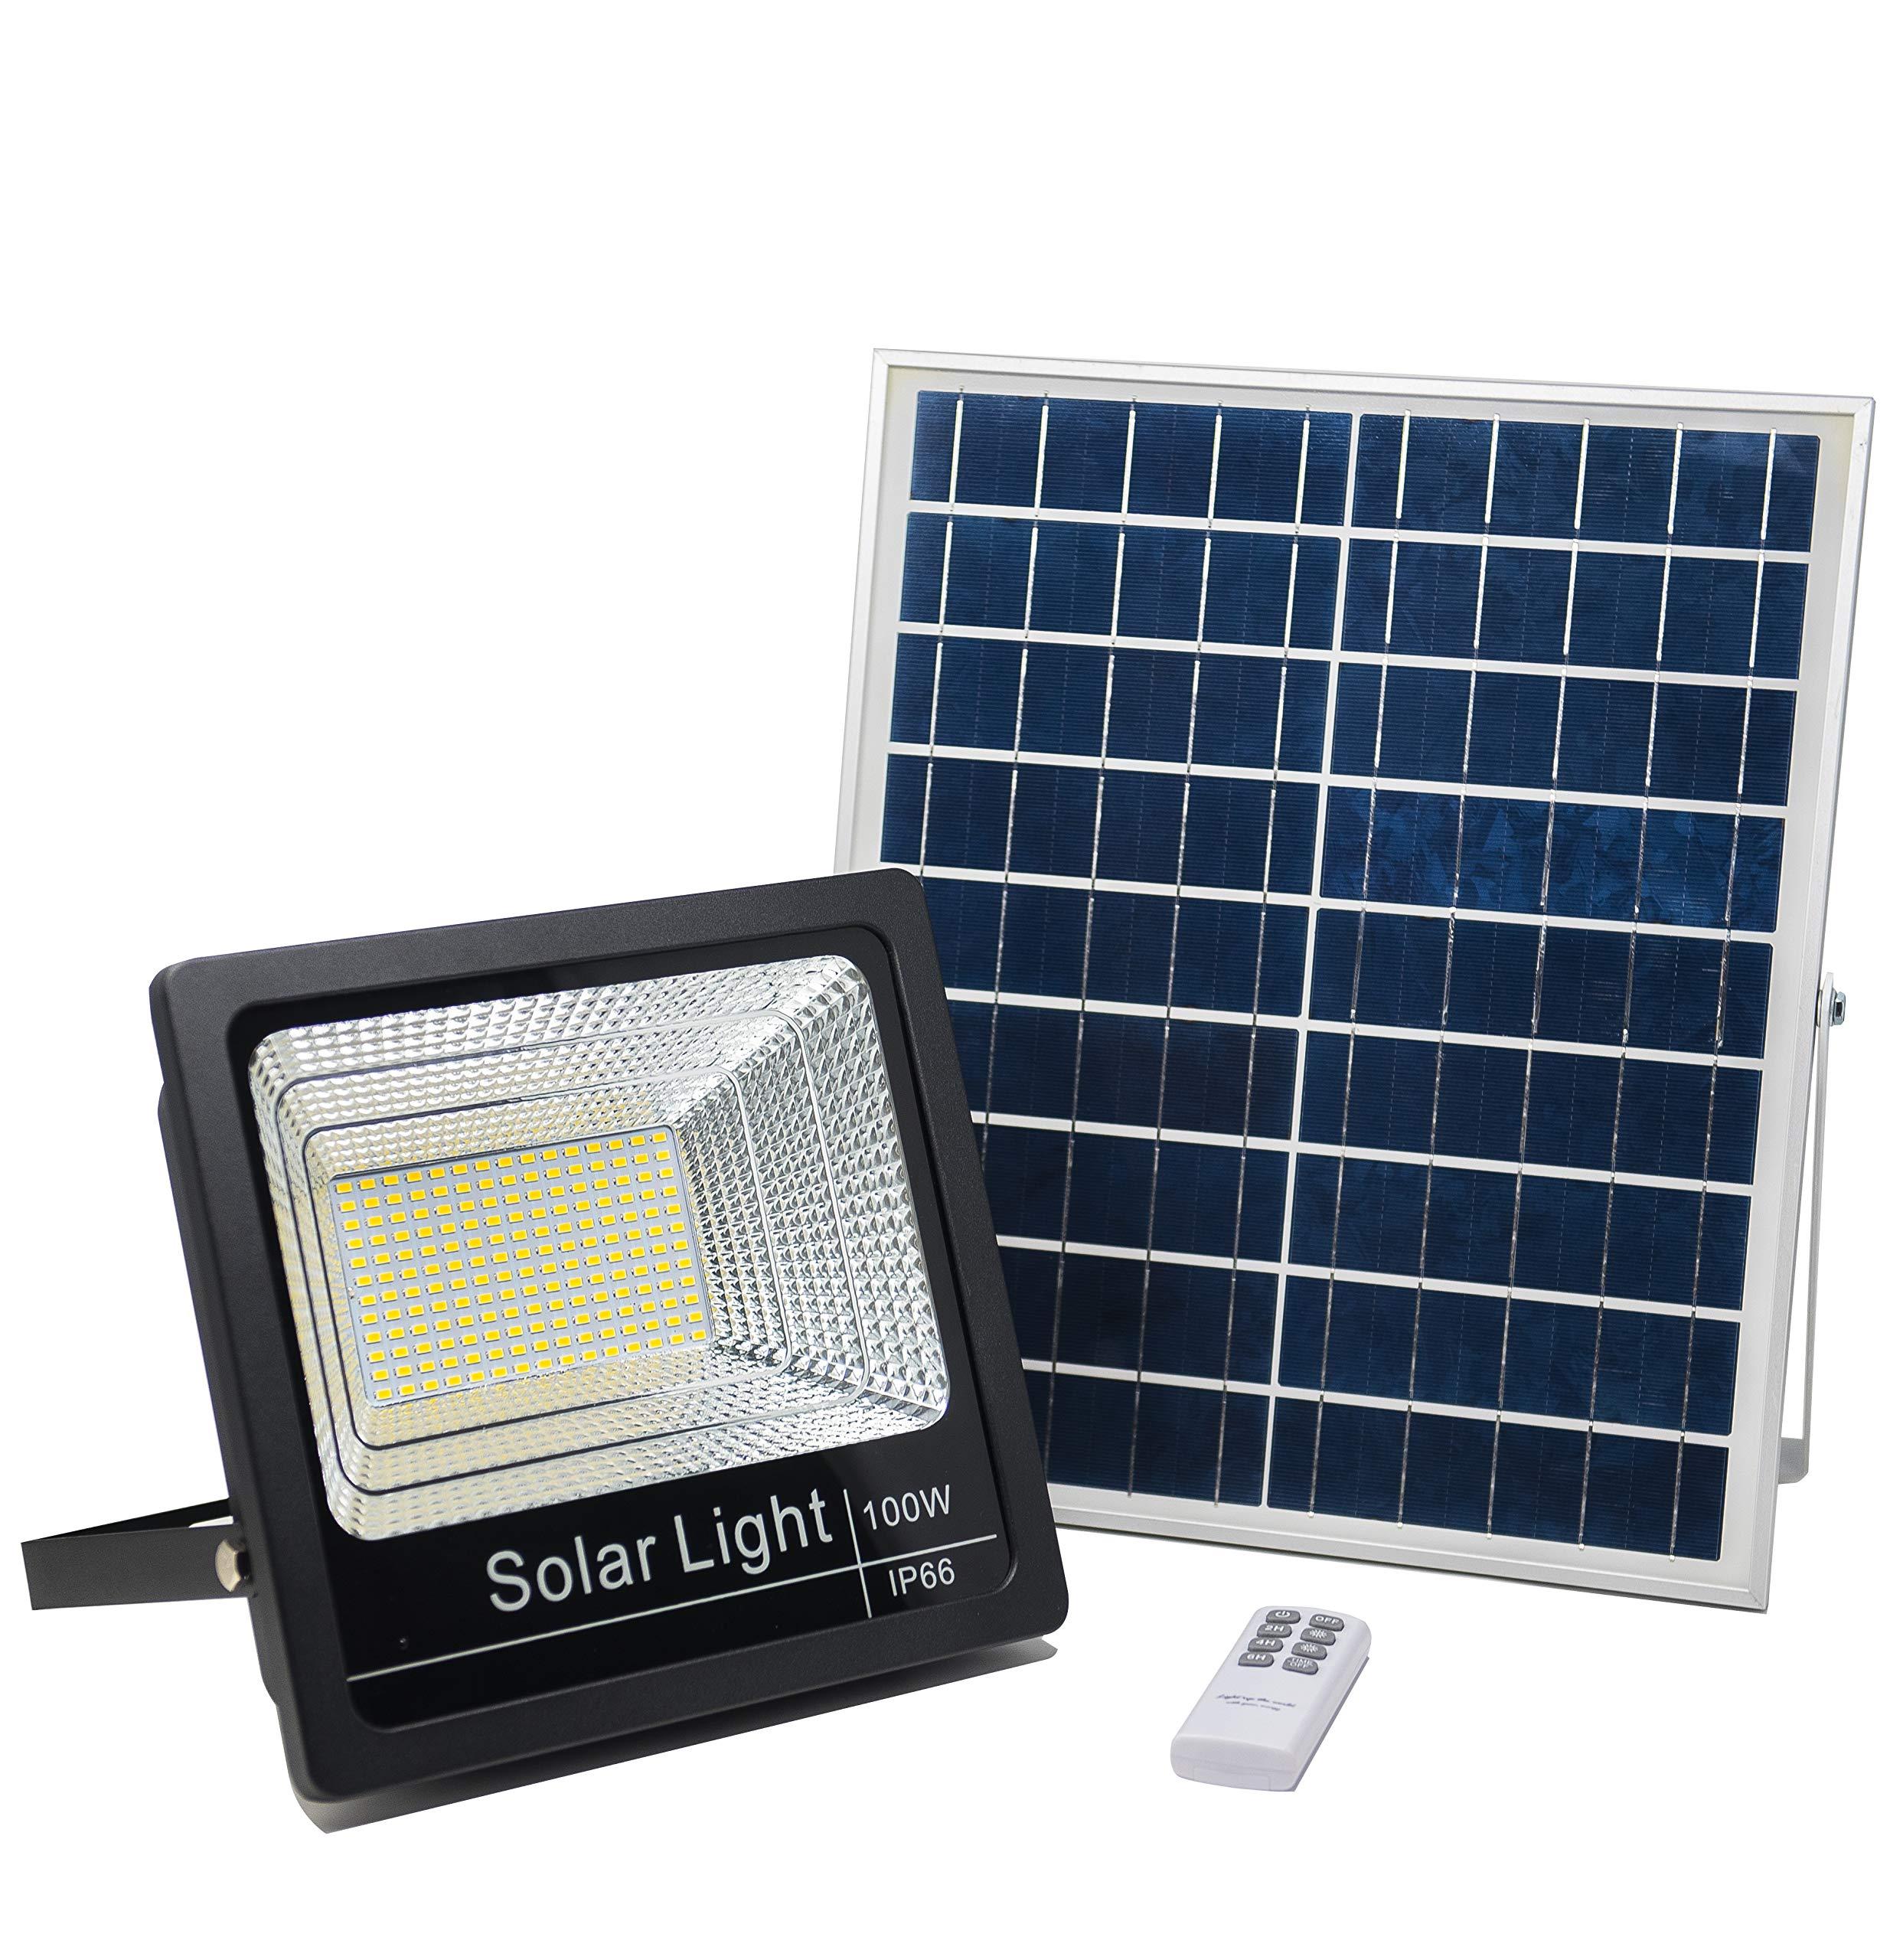 Luz Solar Exterior Mando a Distancia 100W, Foco Solar LED Luz Blanco Neutro 4000K, Lámpara Solar 180 LEDS, Iluminación Solar Hasta 15 HORAS de Luz 5000 LM: Amazon.es: Iluminación